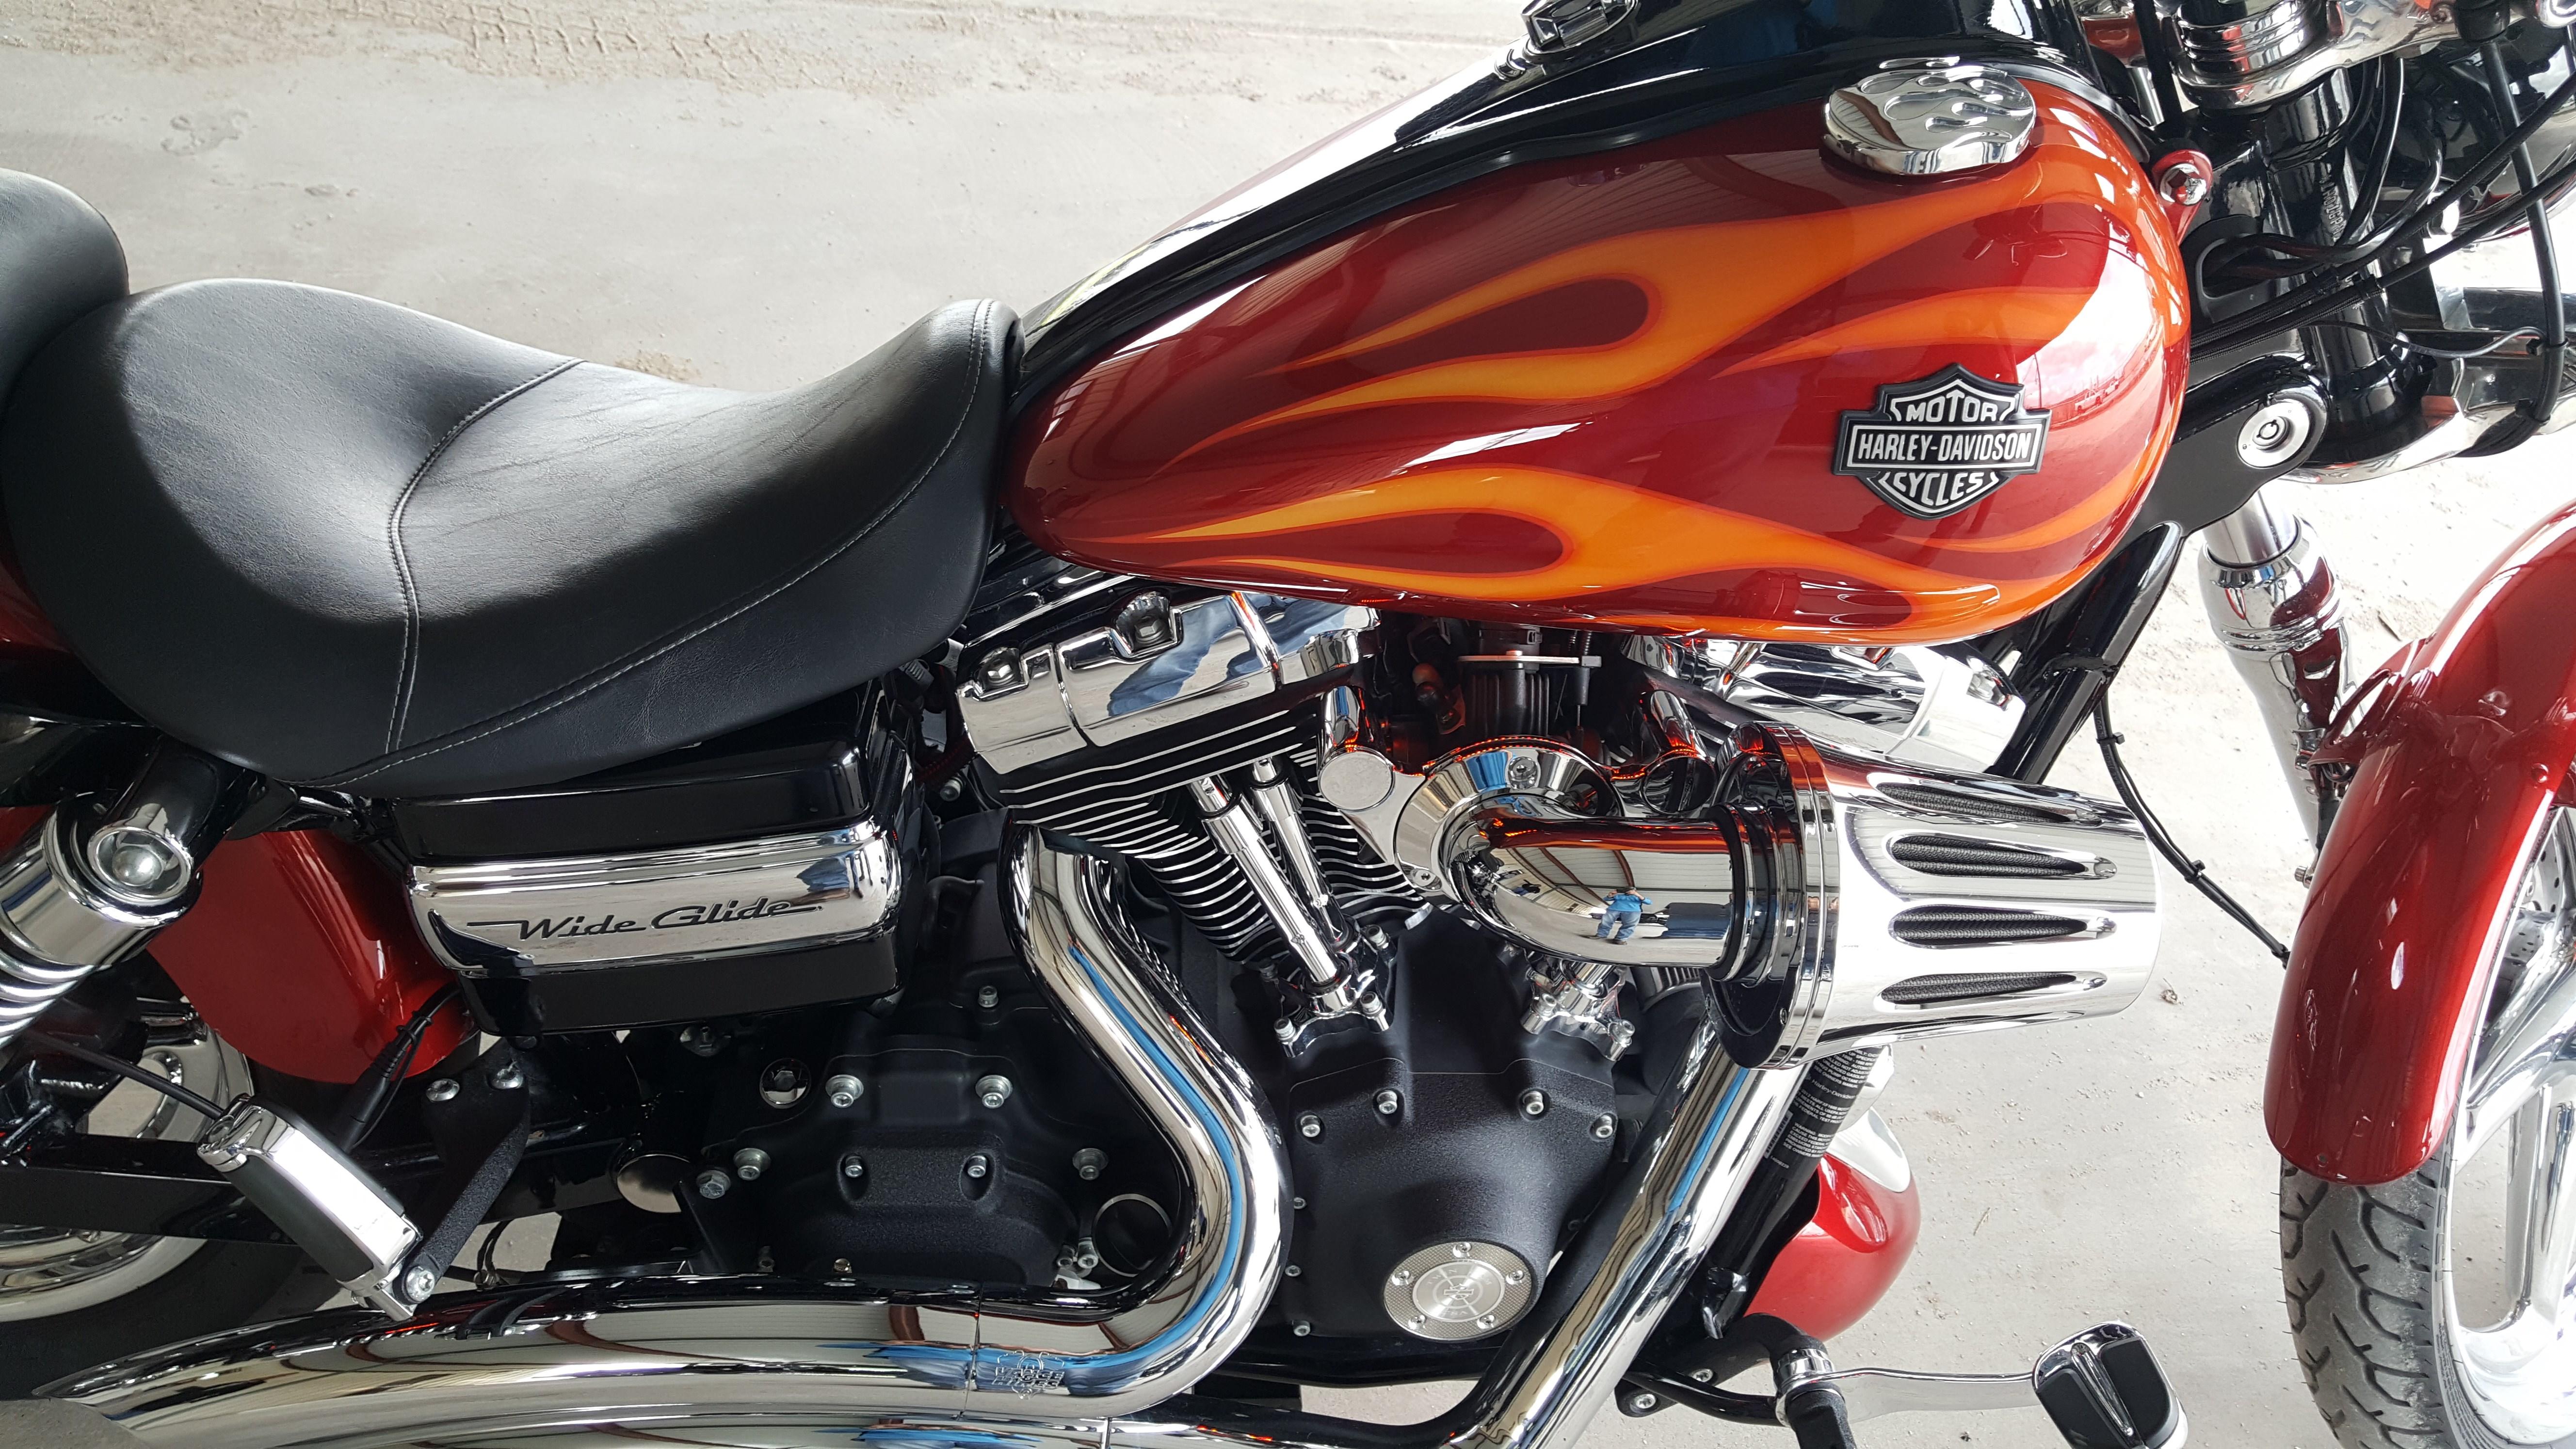 2017 Wide Glide For Sale Texas >> 2012 Harley-Davidson® FXDWG Dyna® Wide Glide® (Red/orange), Cypress, Texas (700864 ...